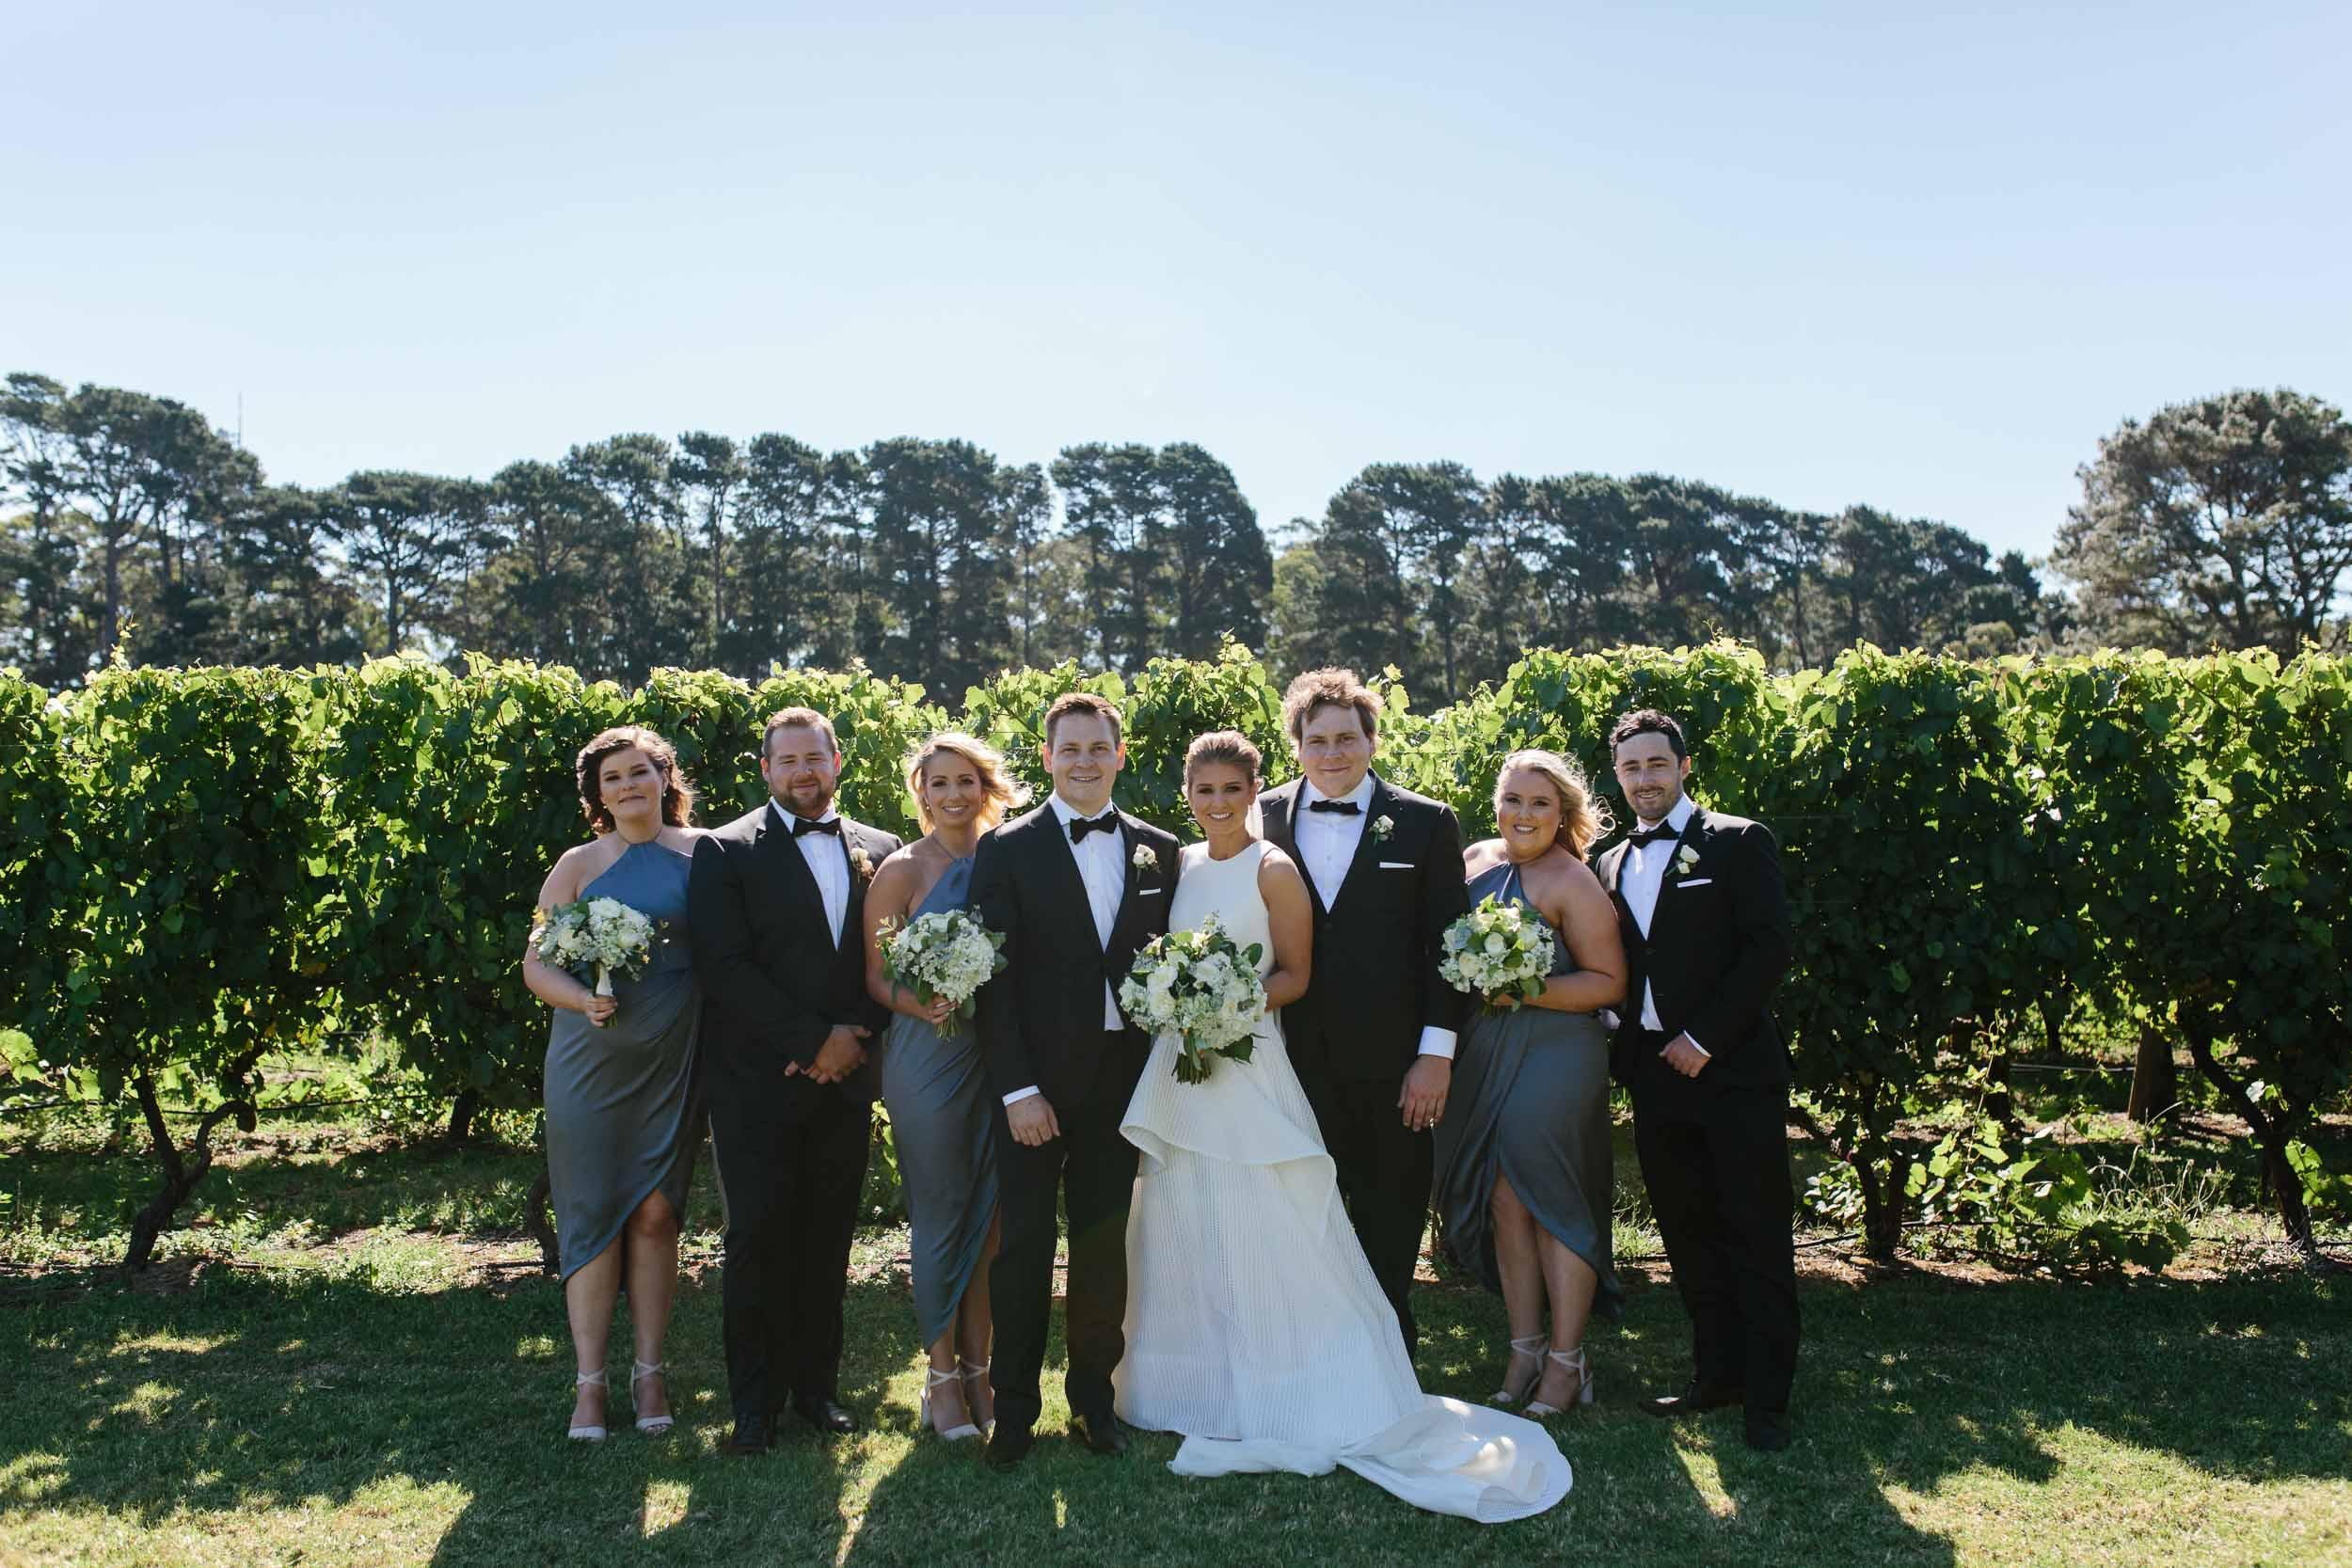 Kas-Richards-Mornington-Peninsula-Wedding-Lindenderry-Red-Hill-377.jpg